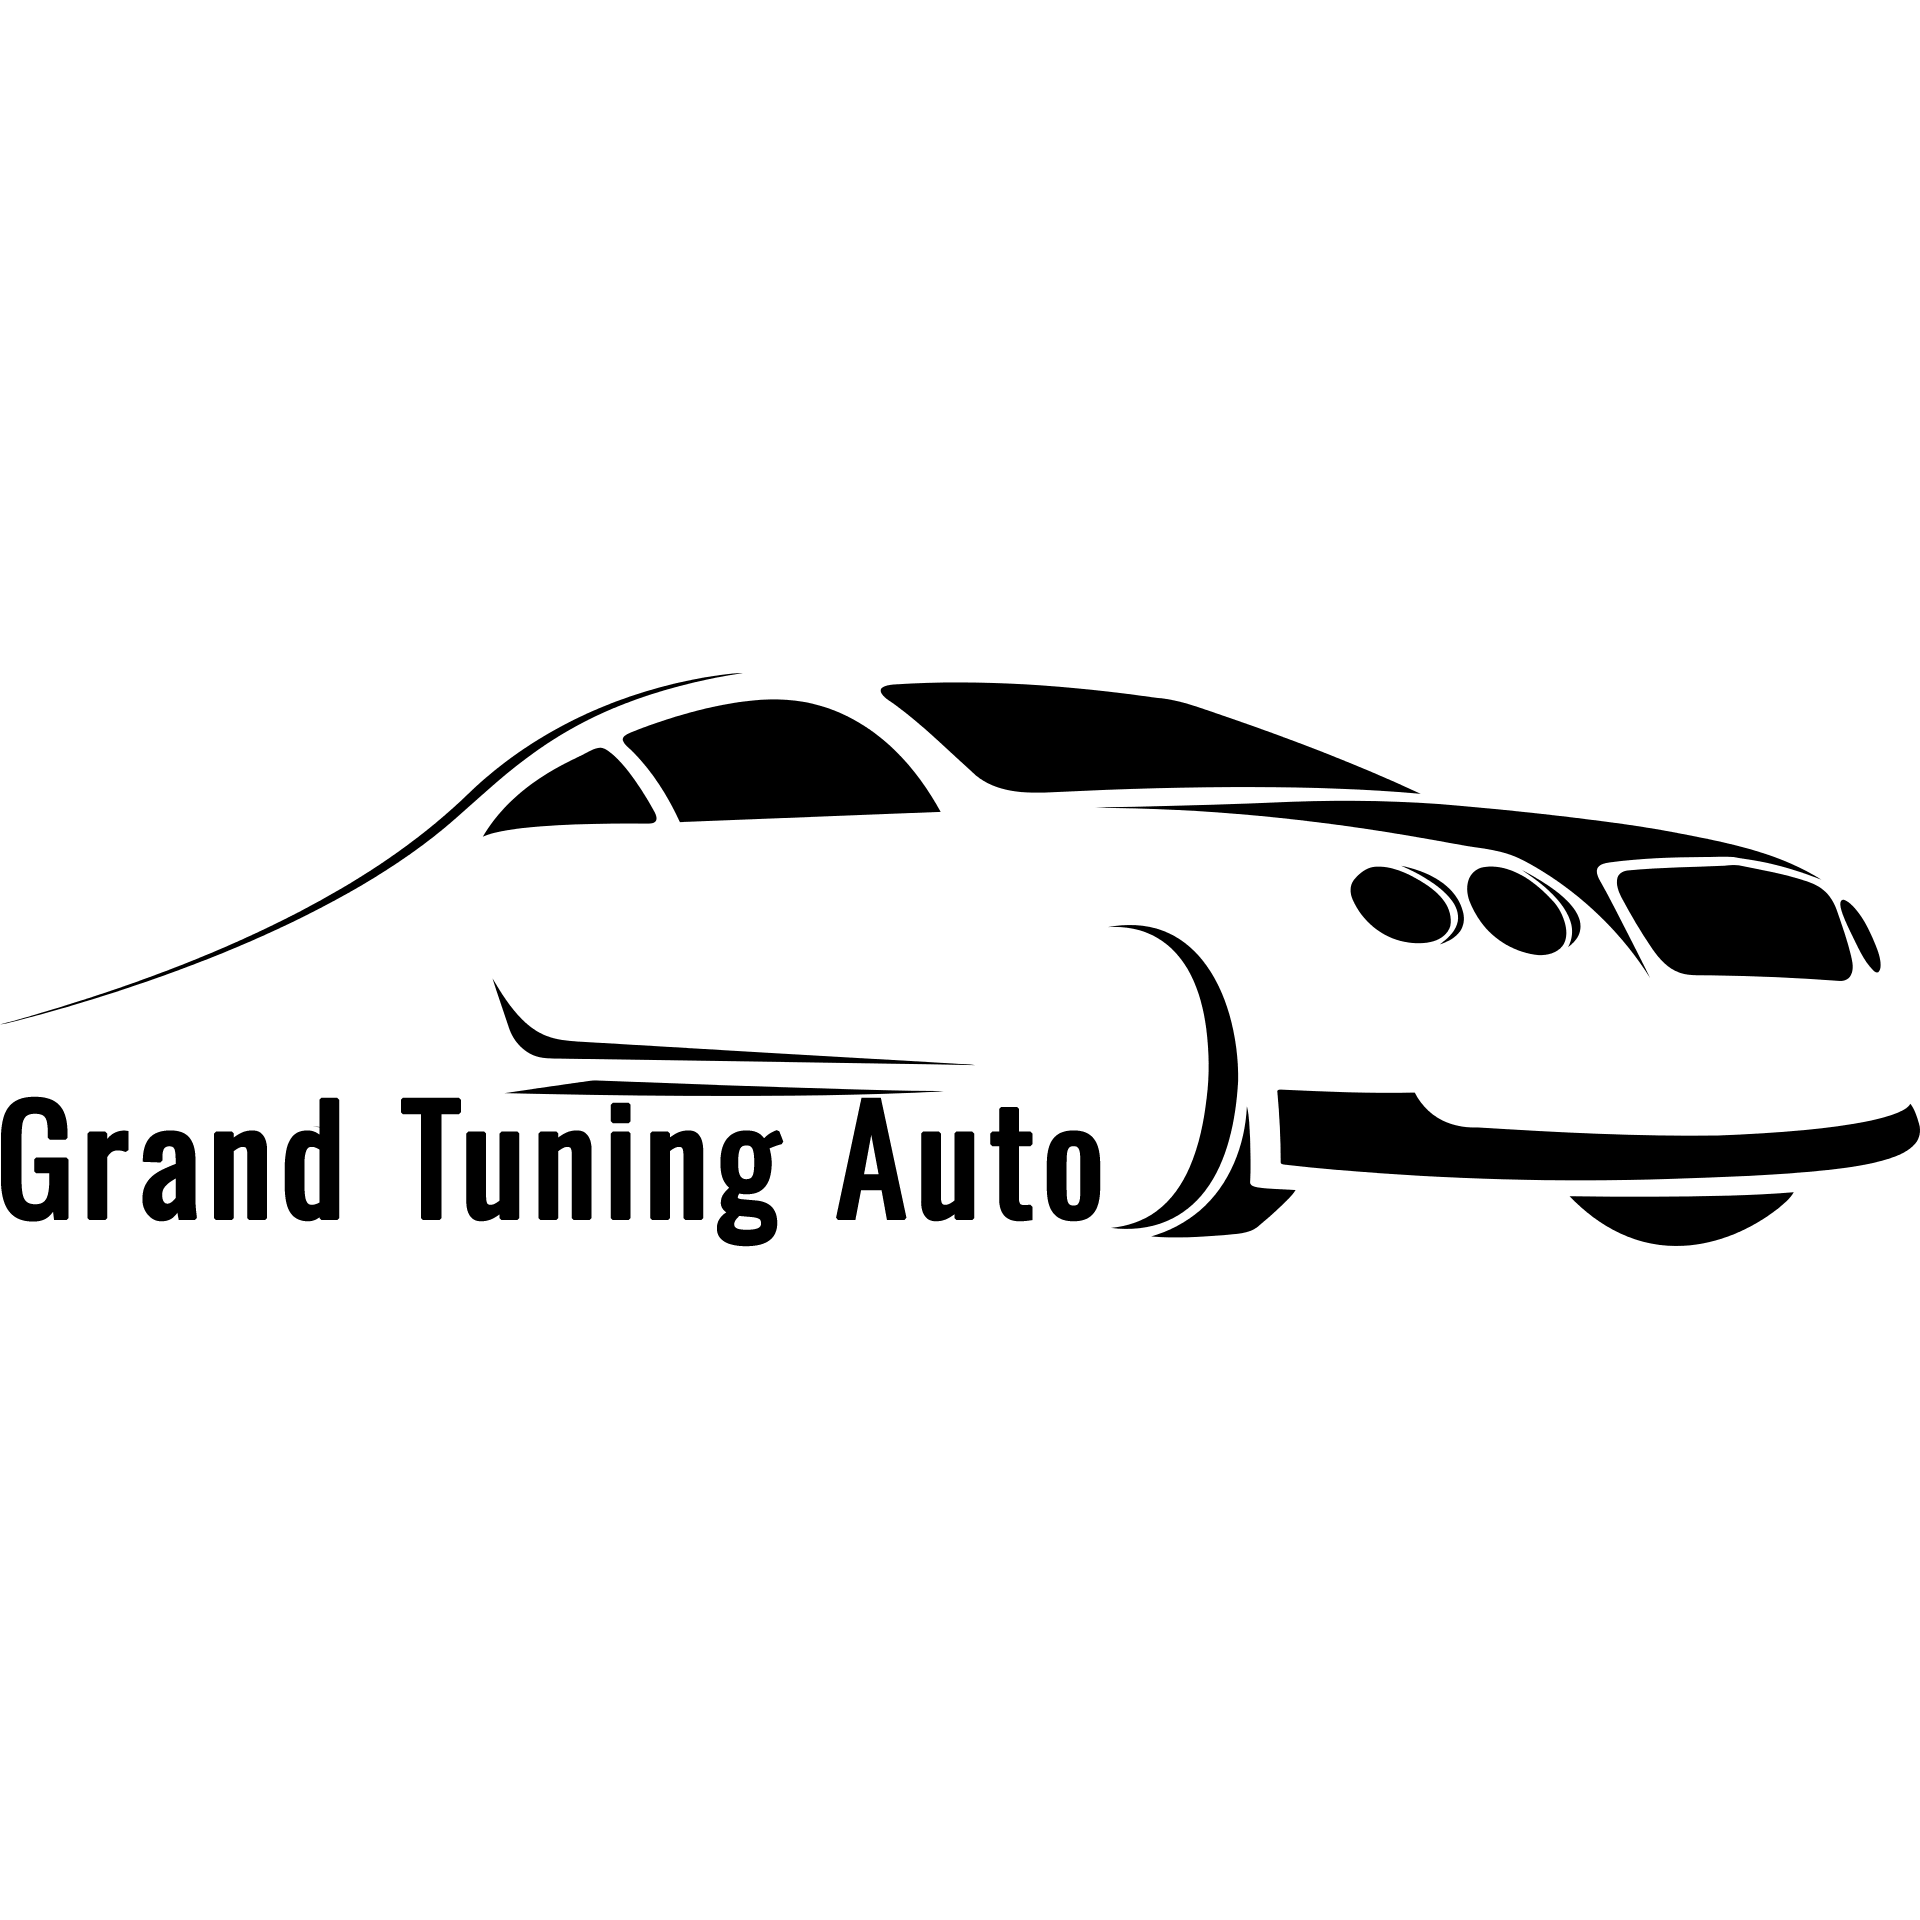 Grand Tuning Auto